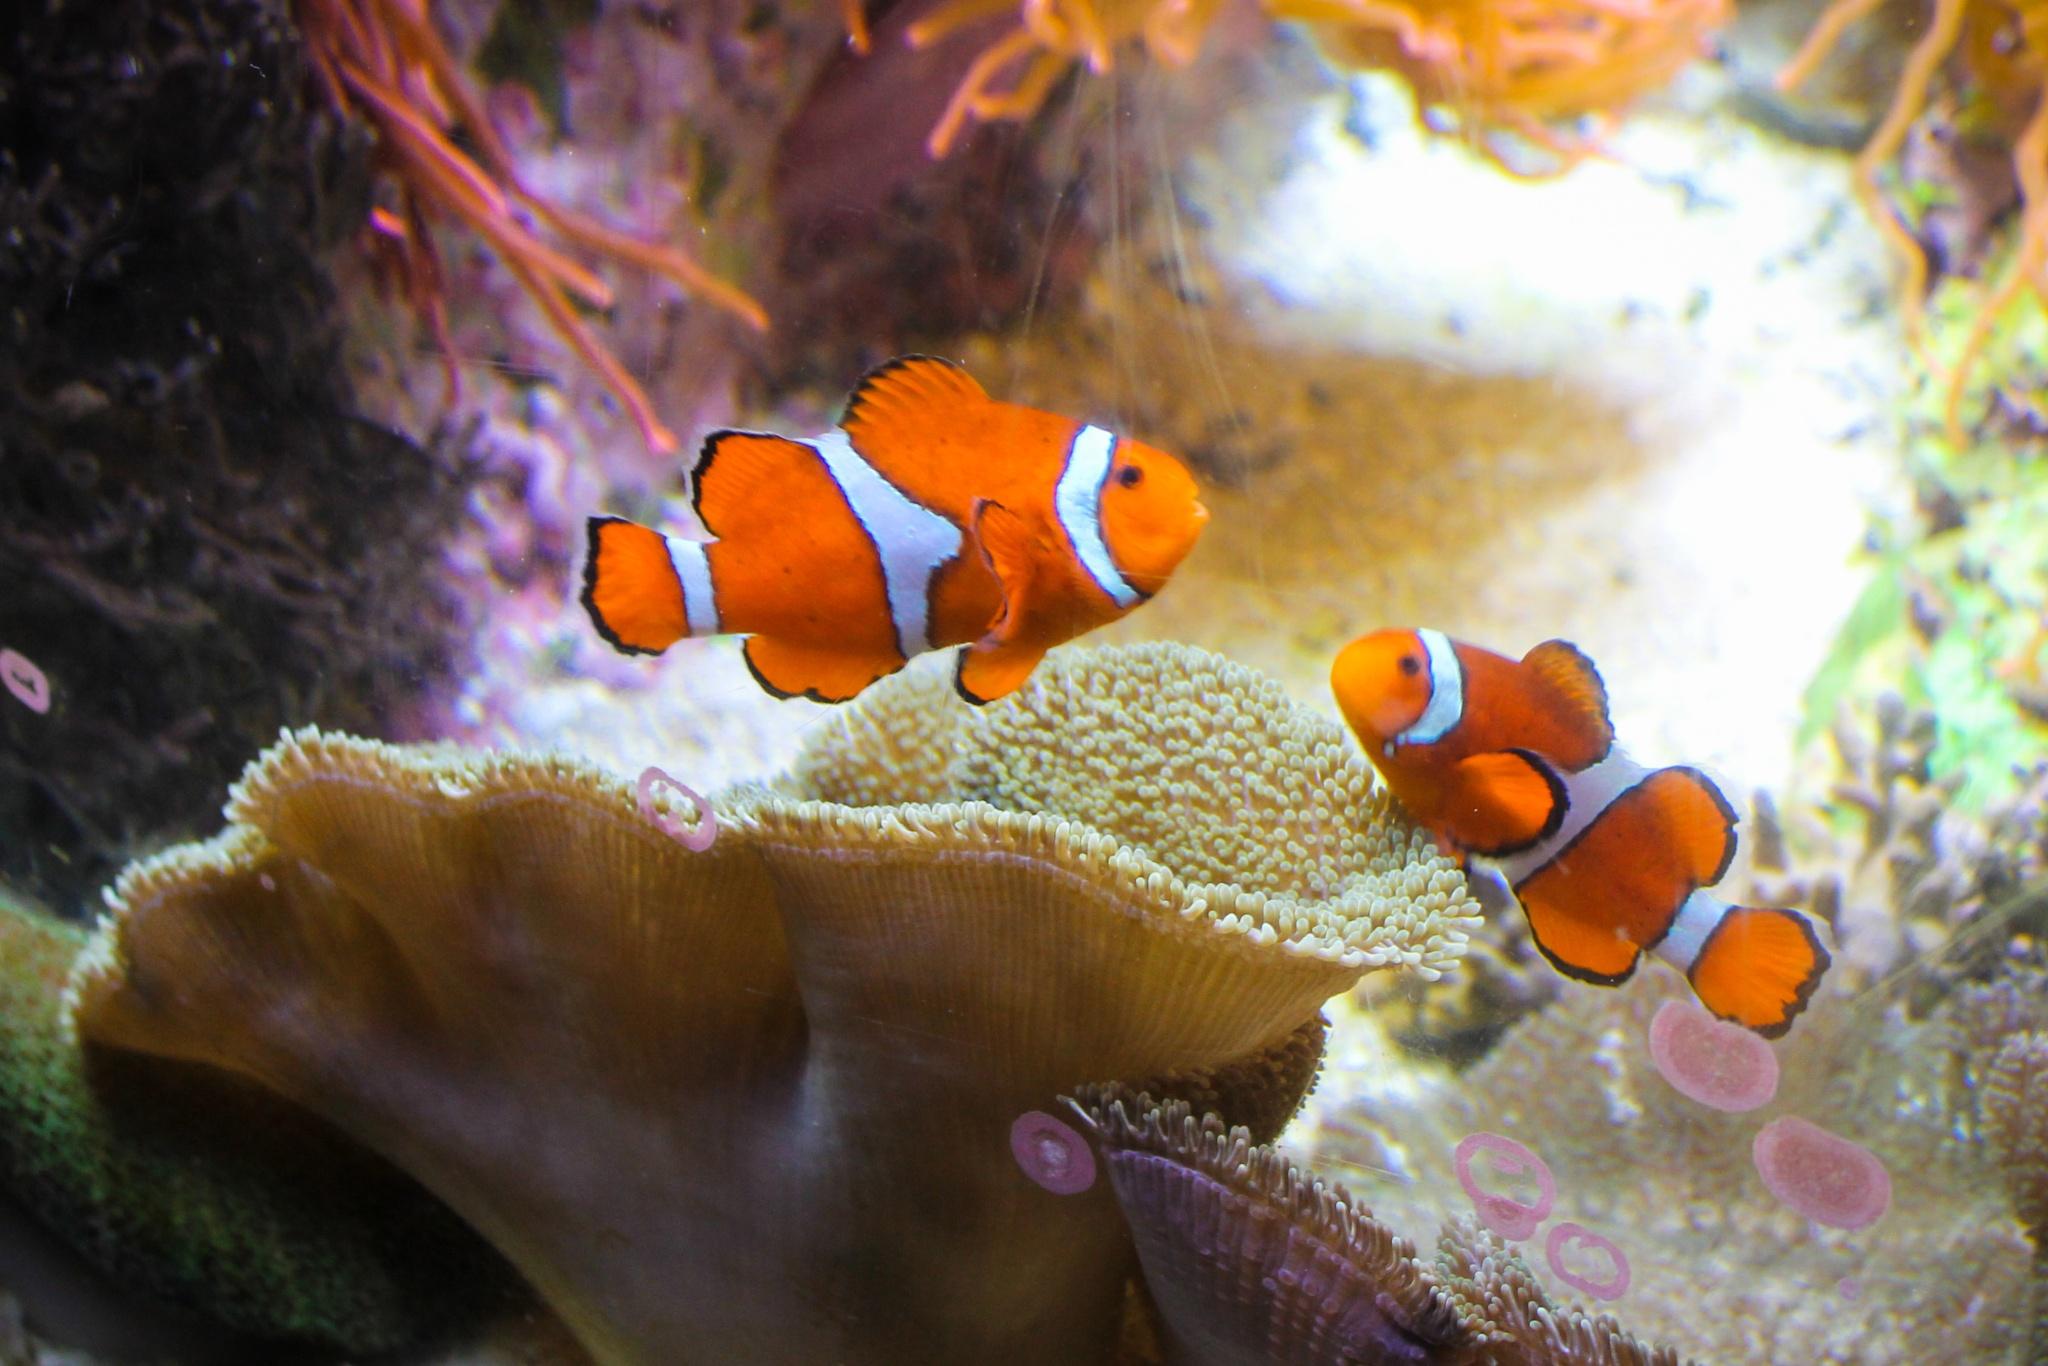 Marlin and Nemo by Mark Hootman